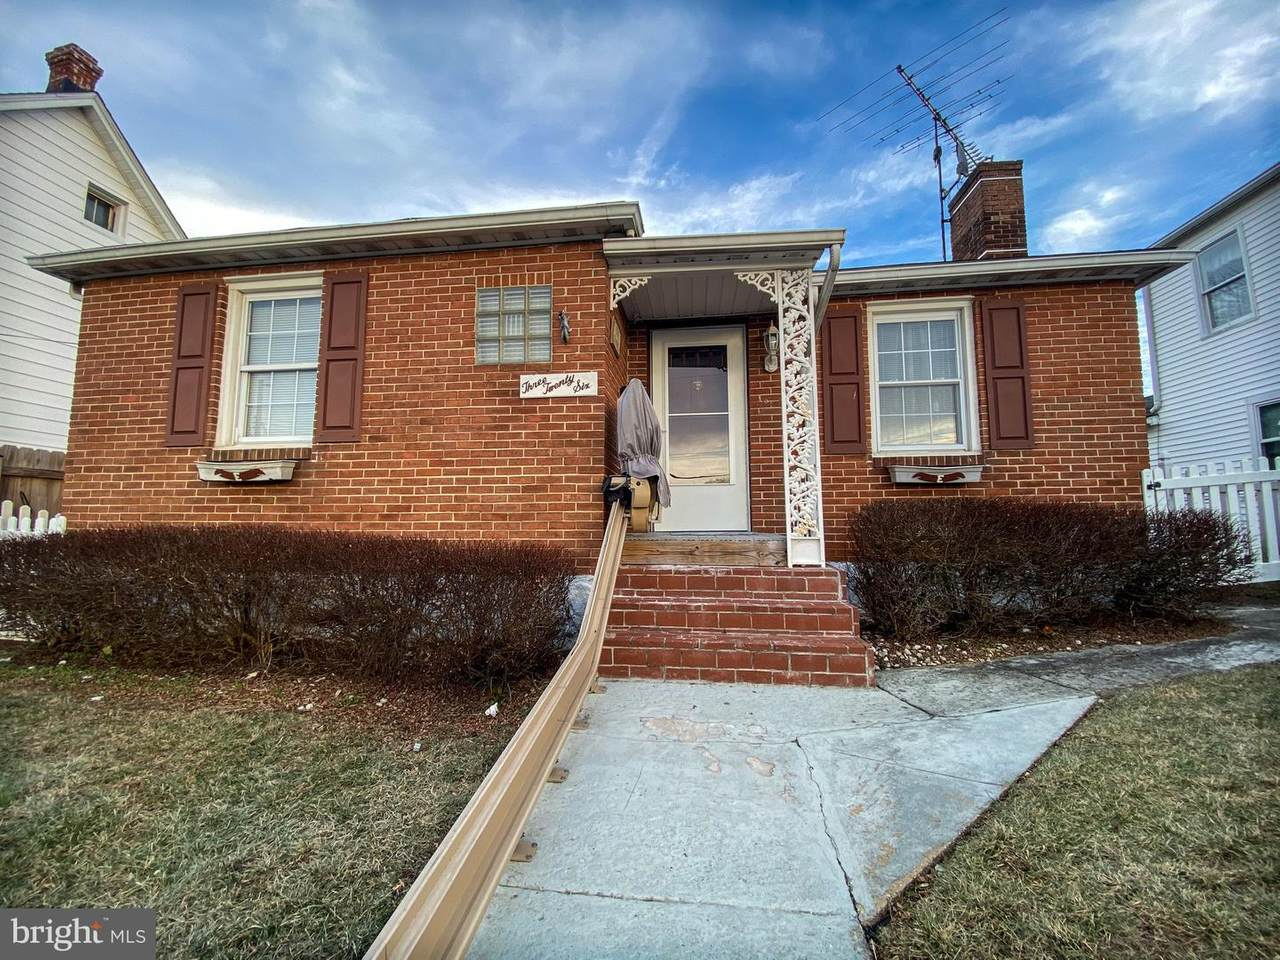 326 Vista Street - Photo 1